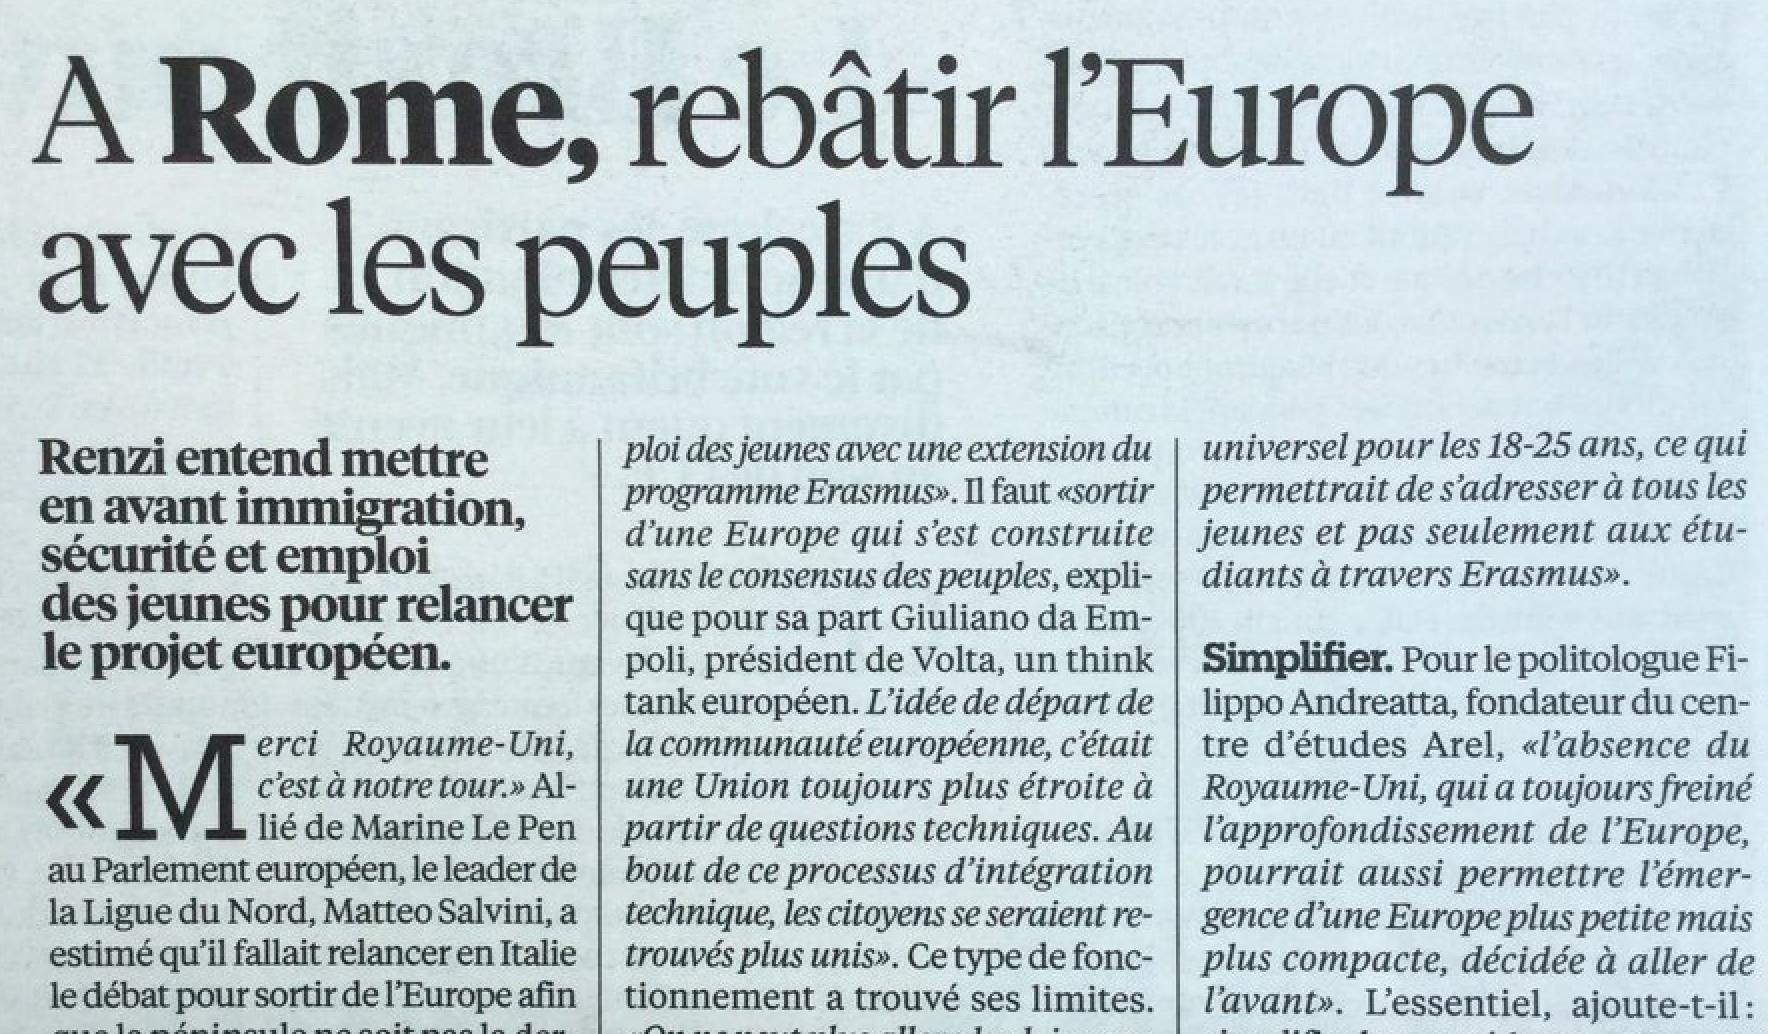 Una dimensione politica e culturale per l'Europa